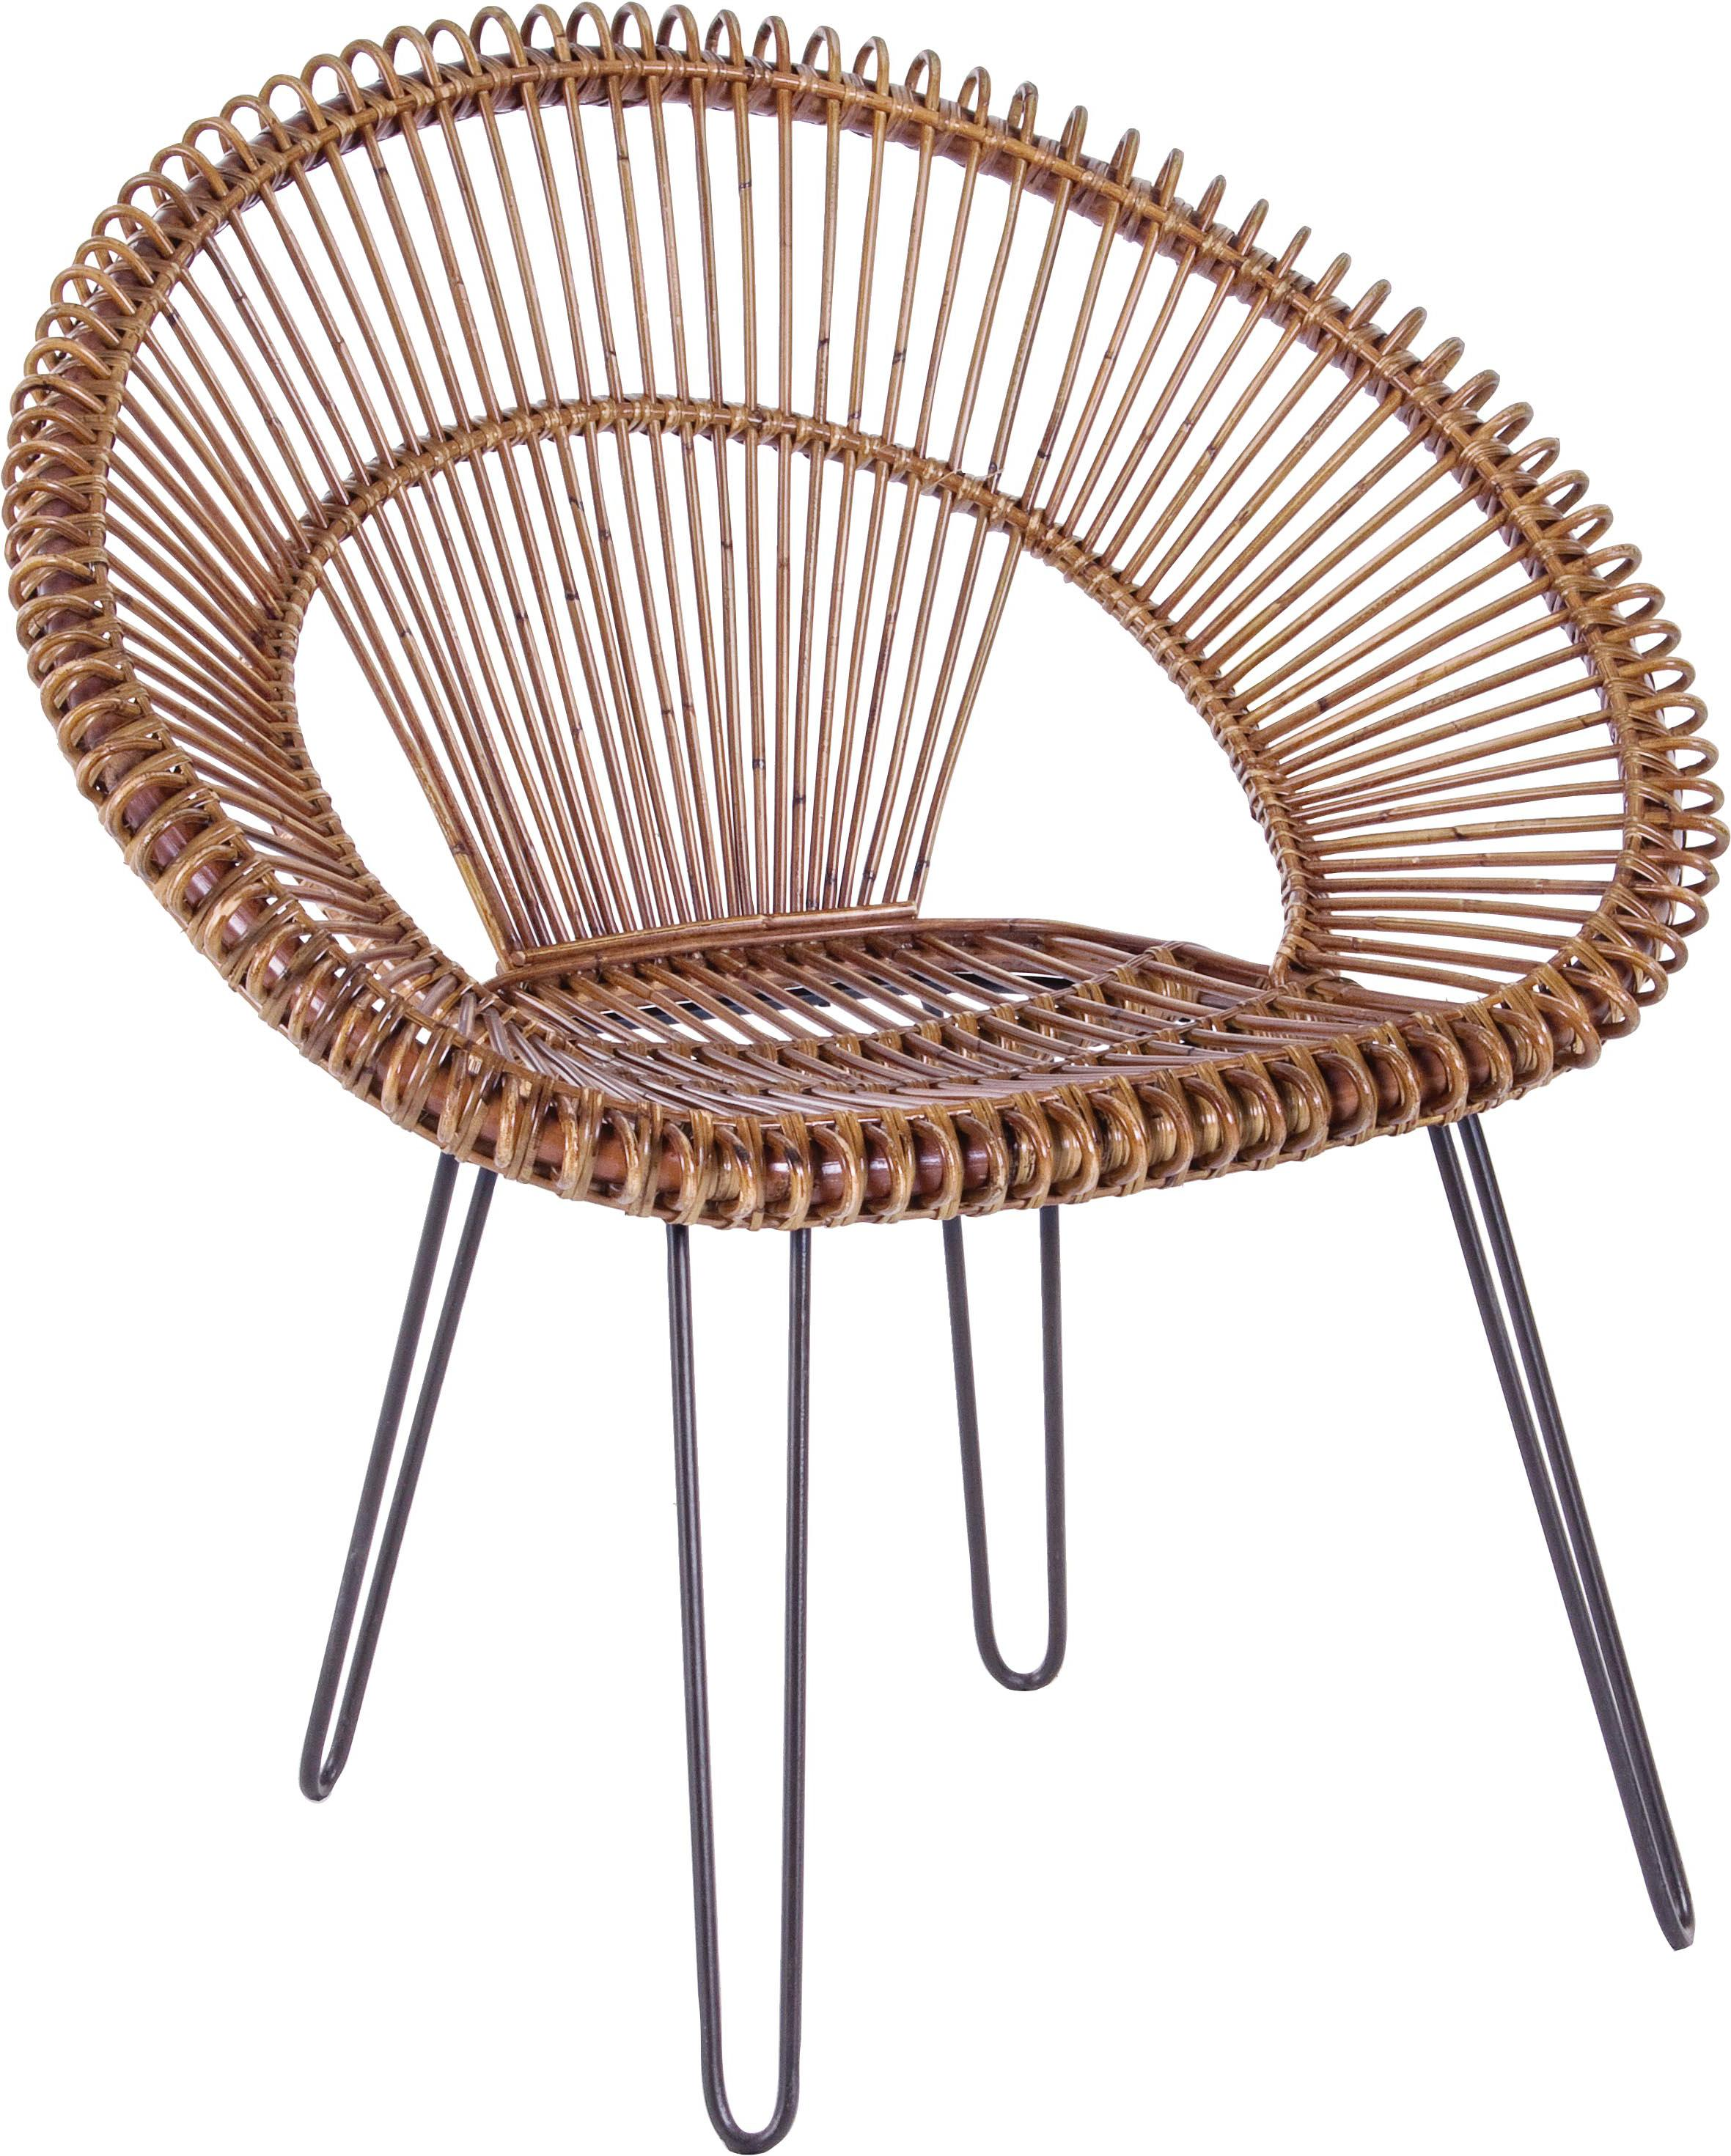 Rotan fauteuil Esteban, Zitvlak: rotan, Poten: staal, Zitvlak: rotankleurig. Poten: staalkleurig, 64 x 89 cm